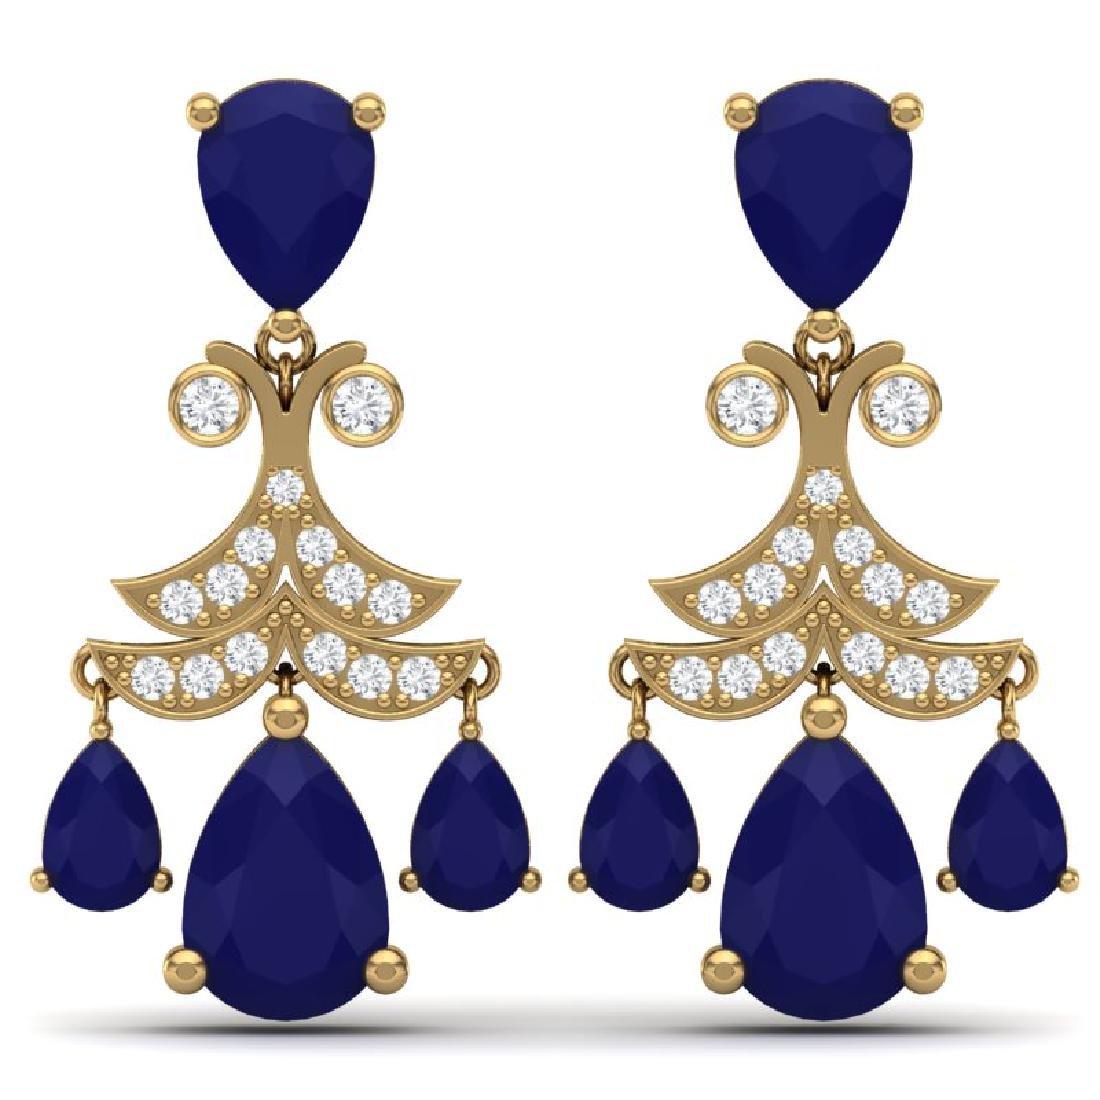 11.97 CTW Royalty Sapphire & VS Diamond Earrings 18K